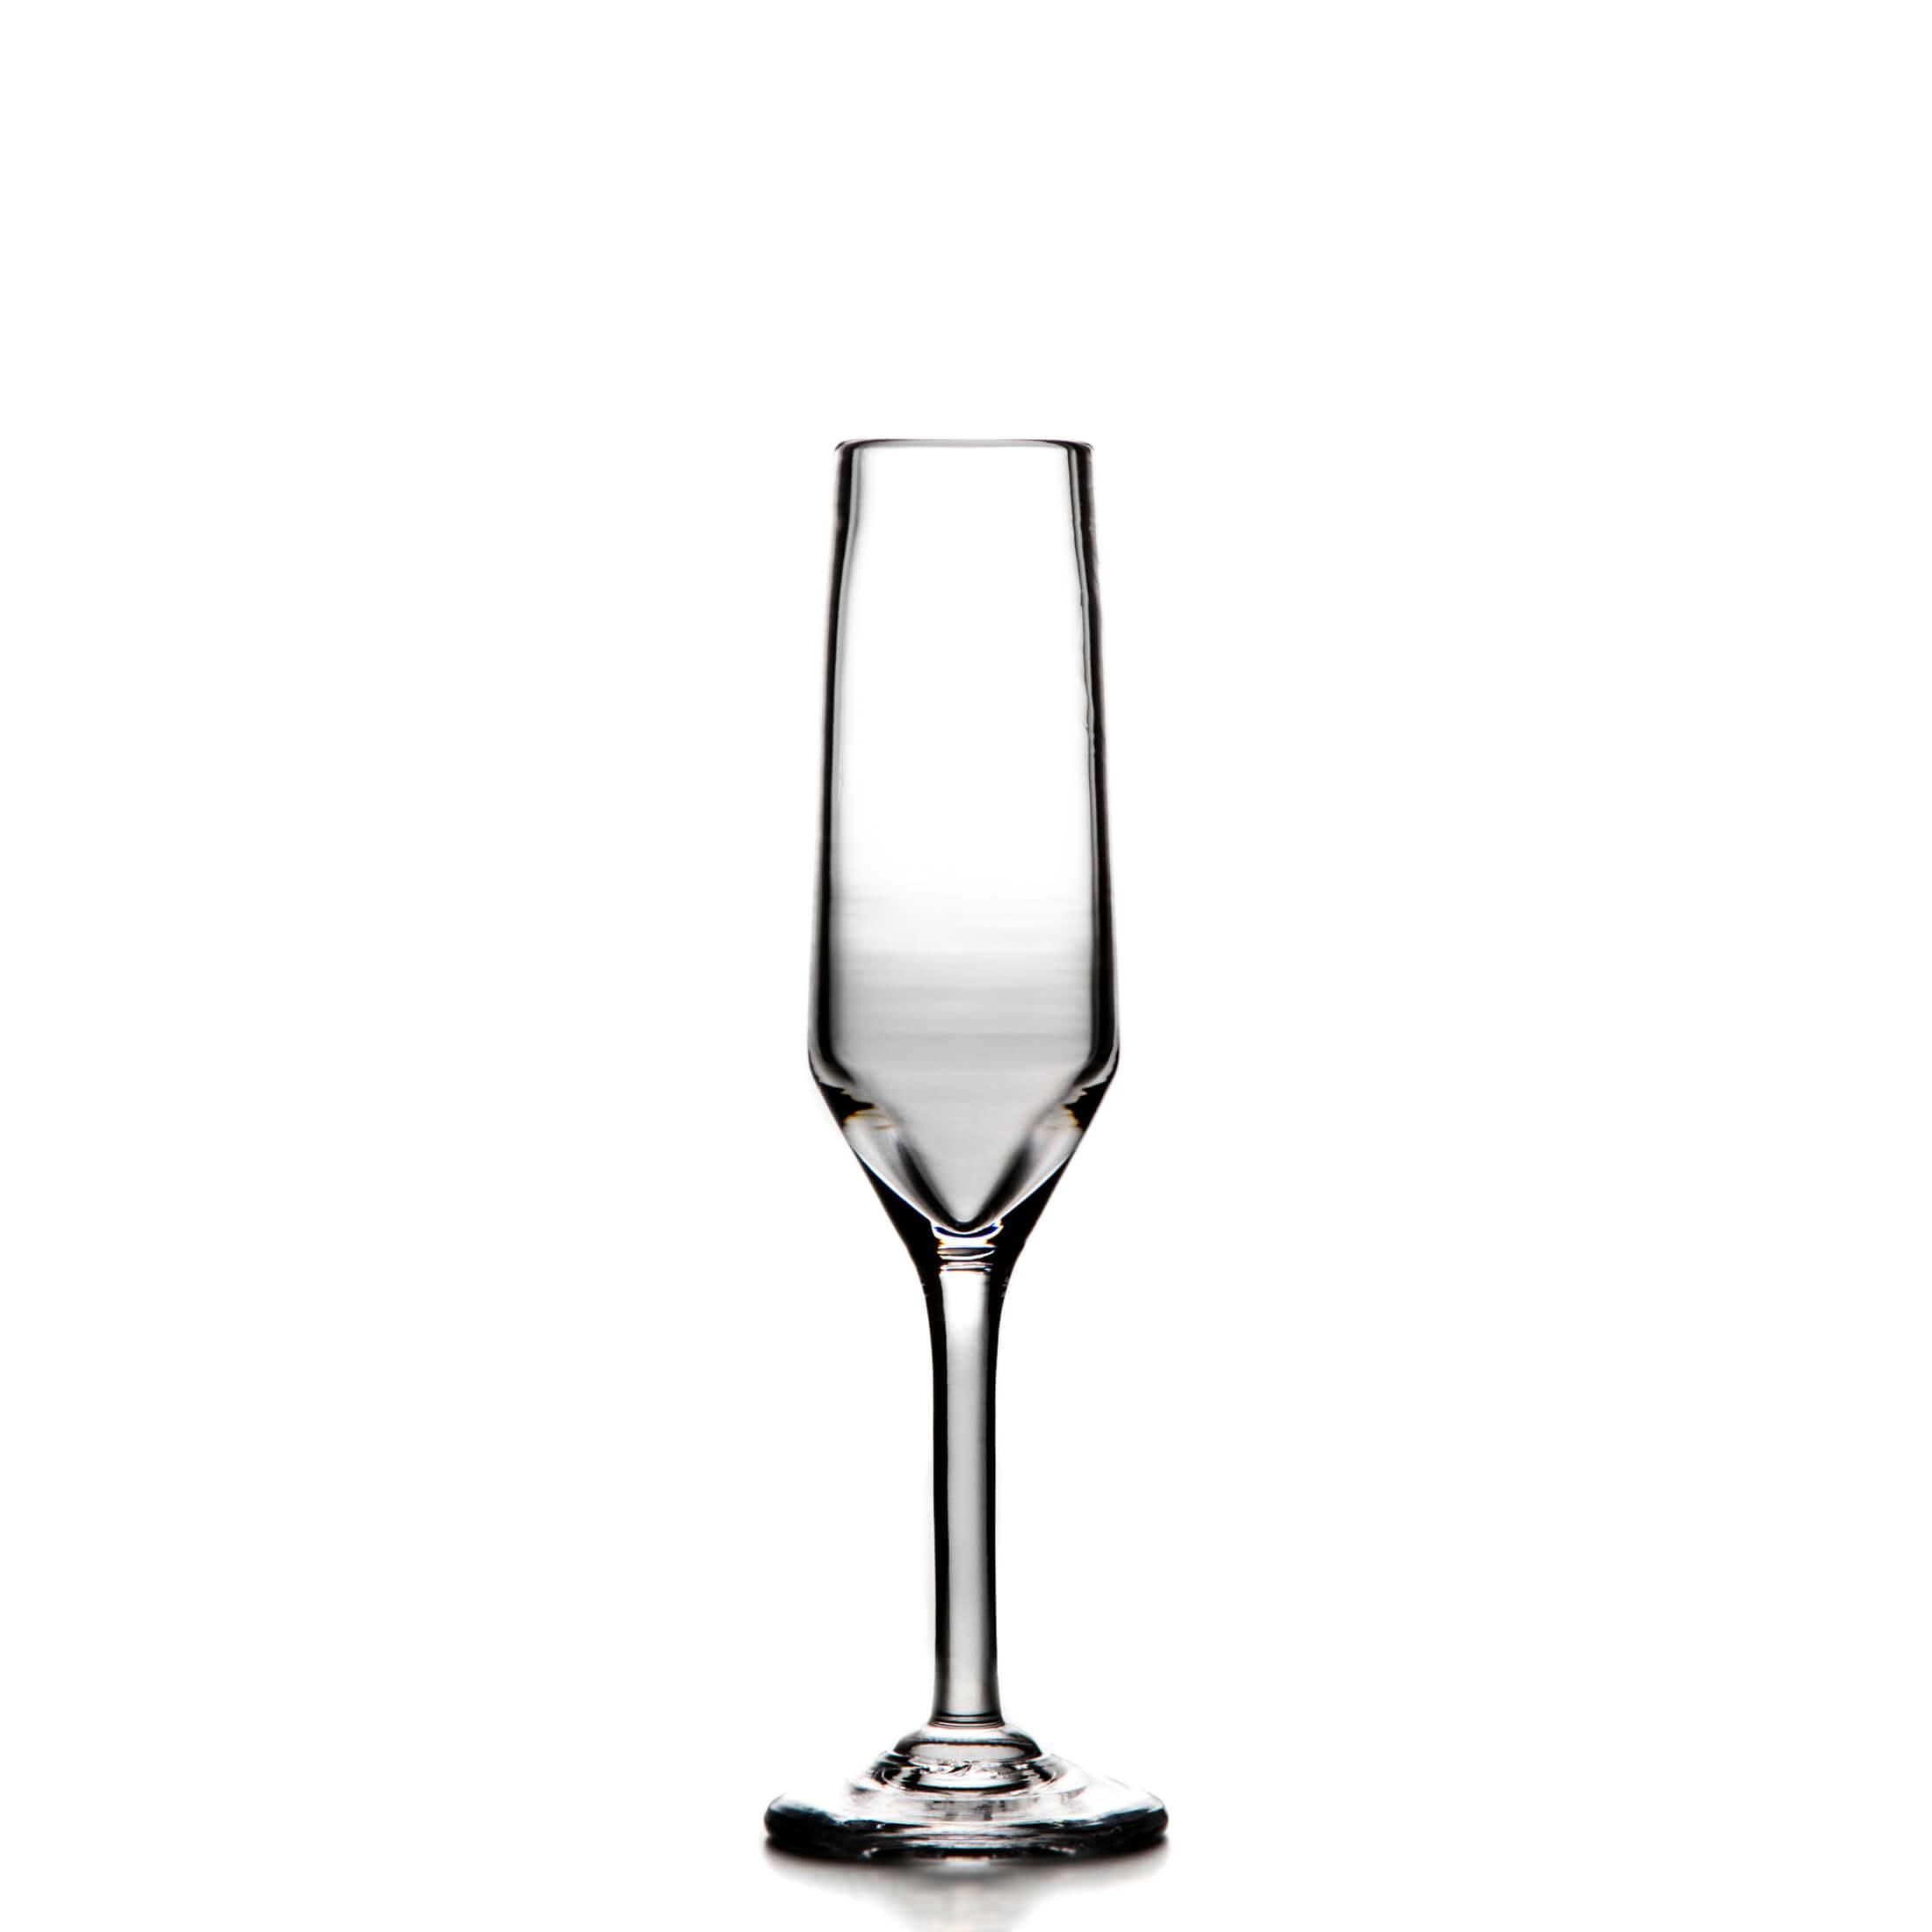 Handblown Wine Glasses + Champagne Flutes | Simon Pearce